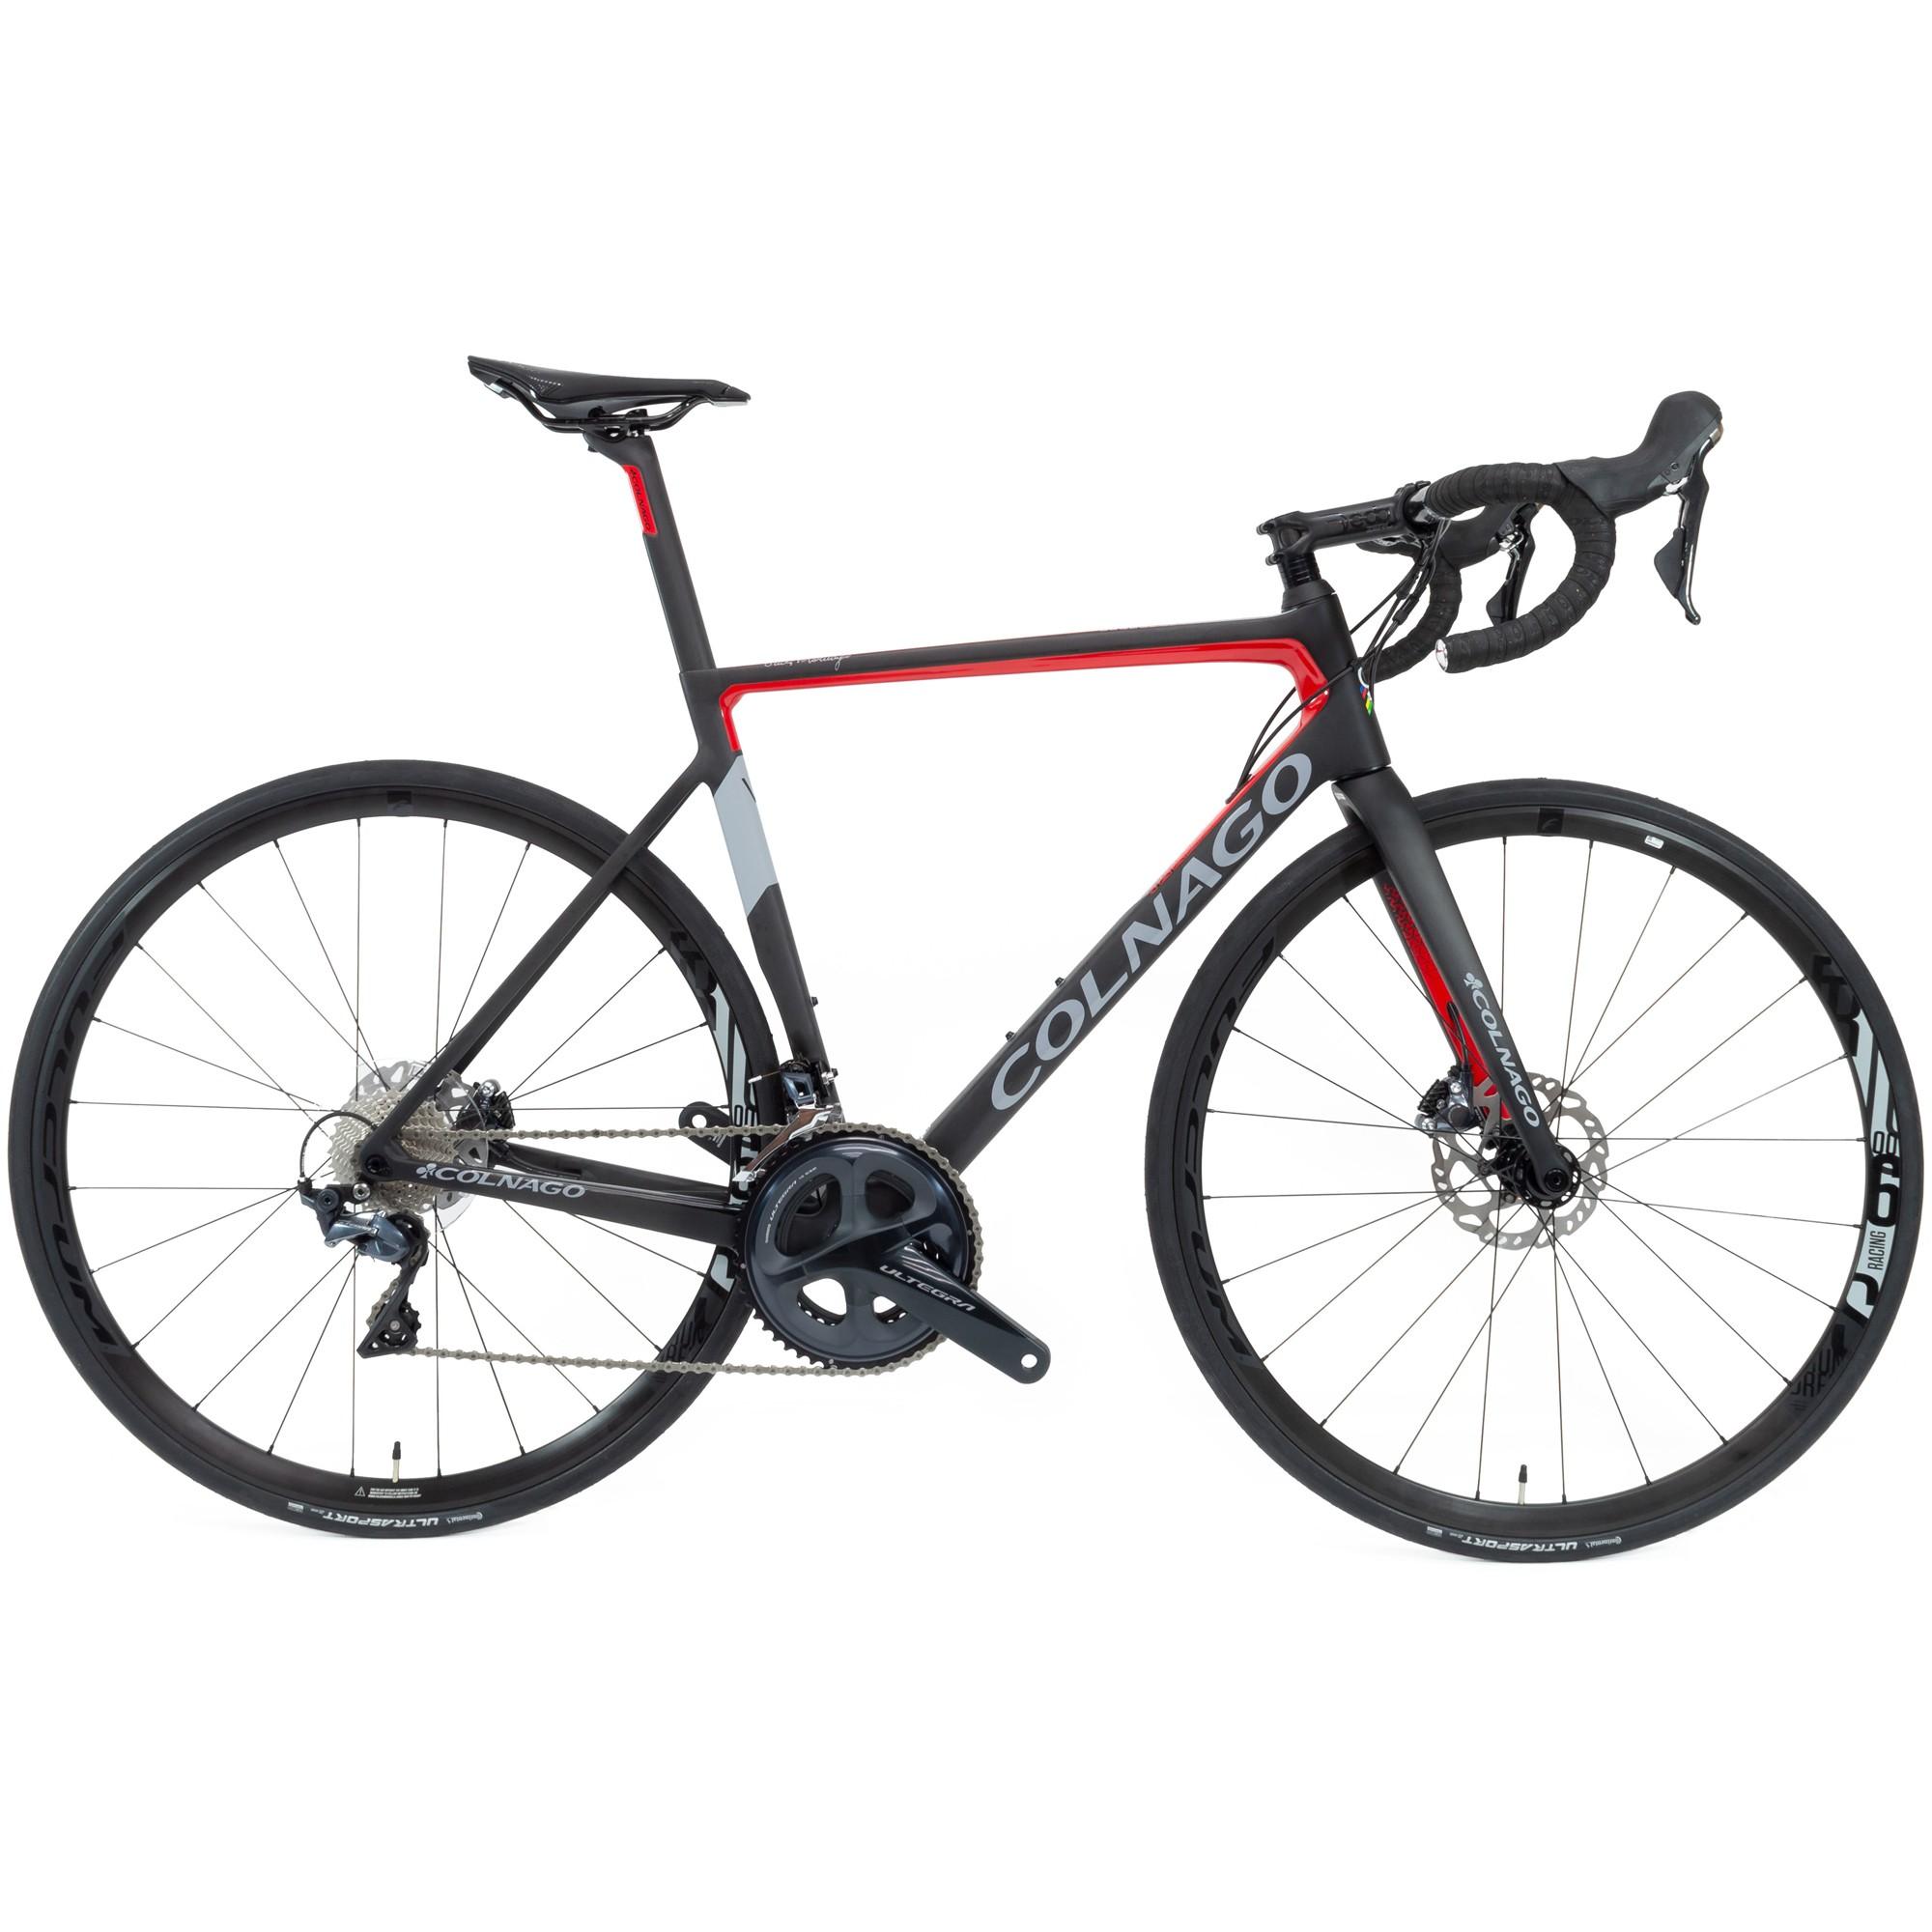 Colnago-V3-Disc-Ultegra-Road-Bike-2020